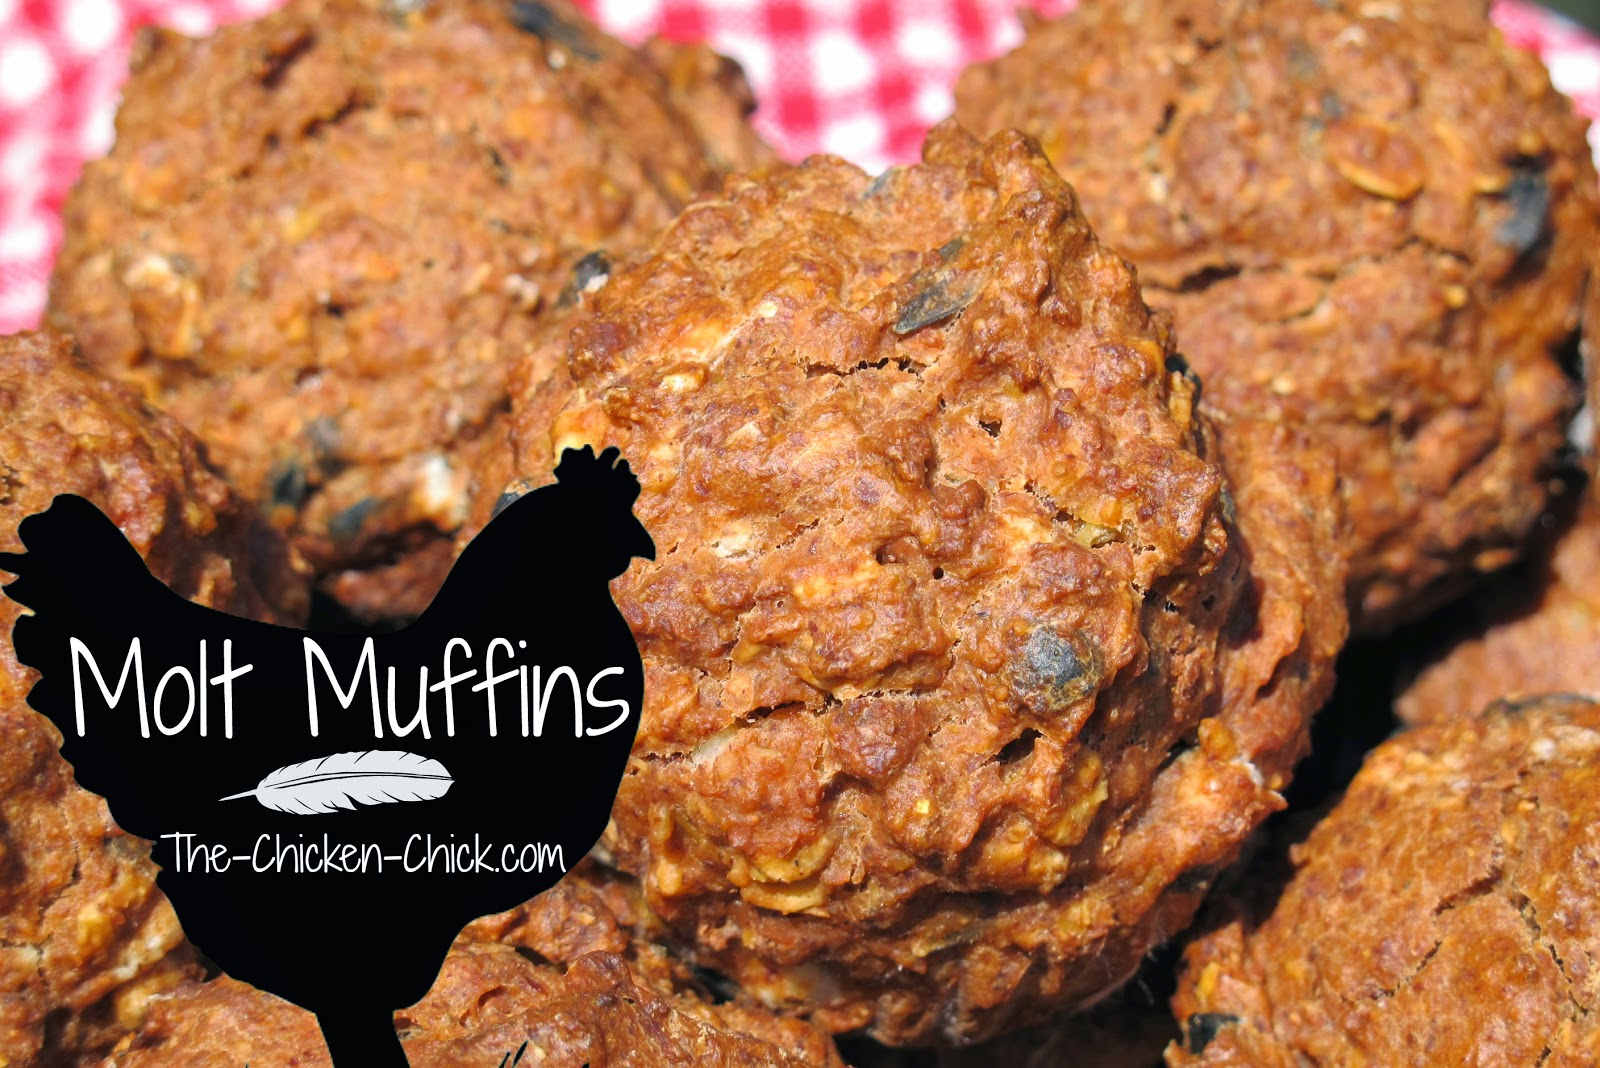 Molt Muffins